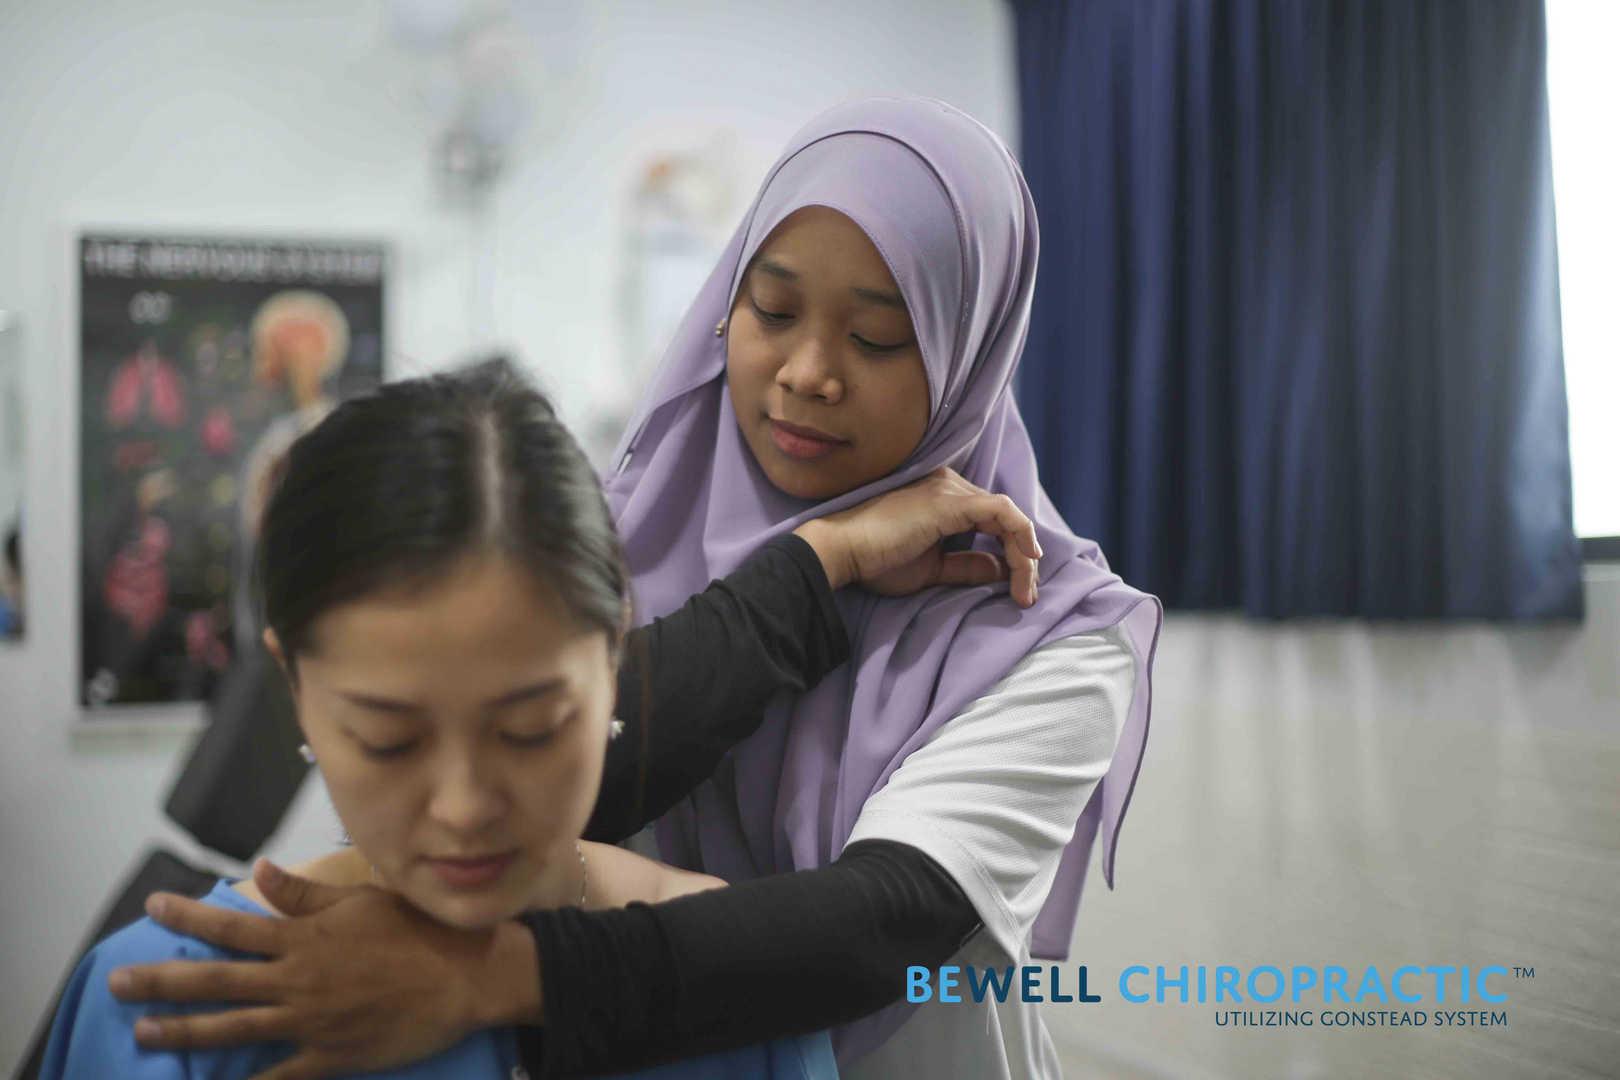 bewell chiropractic